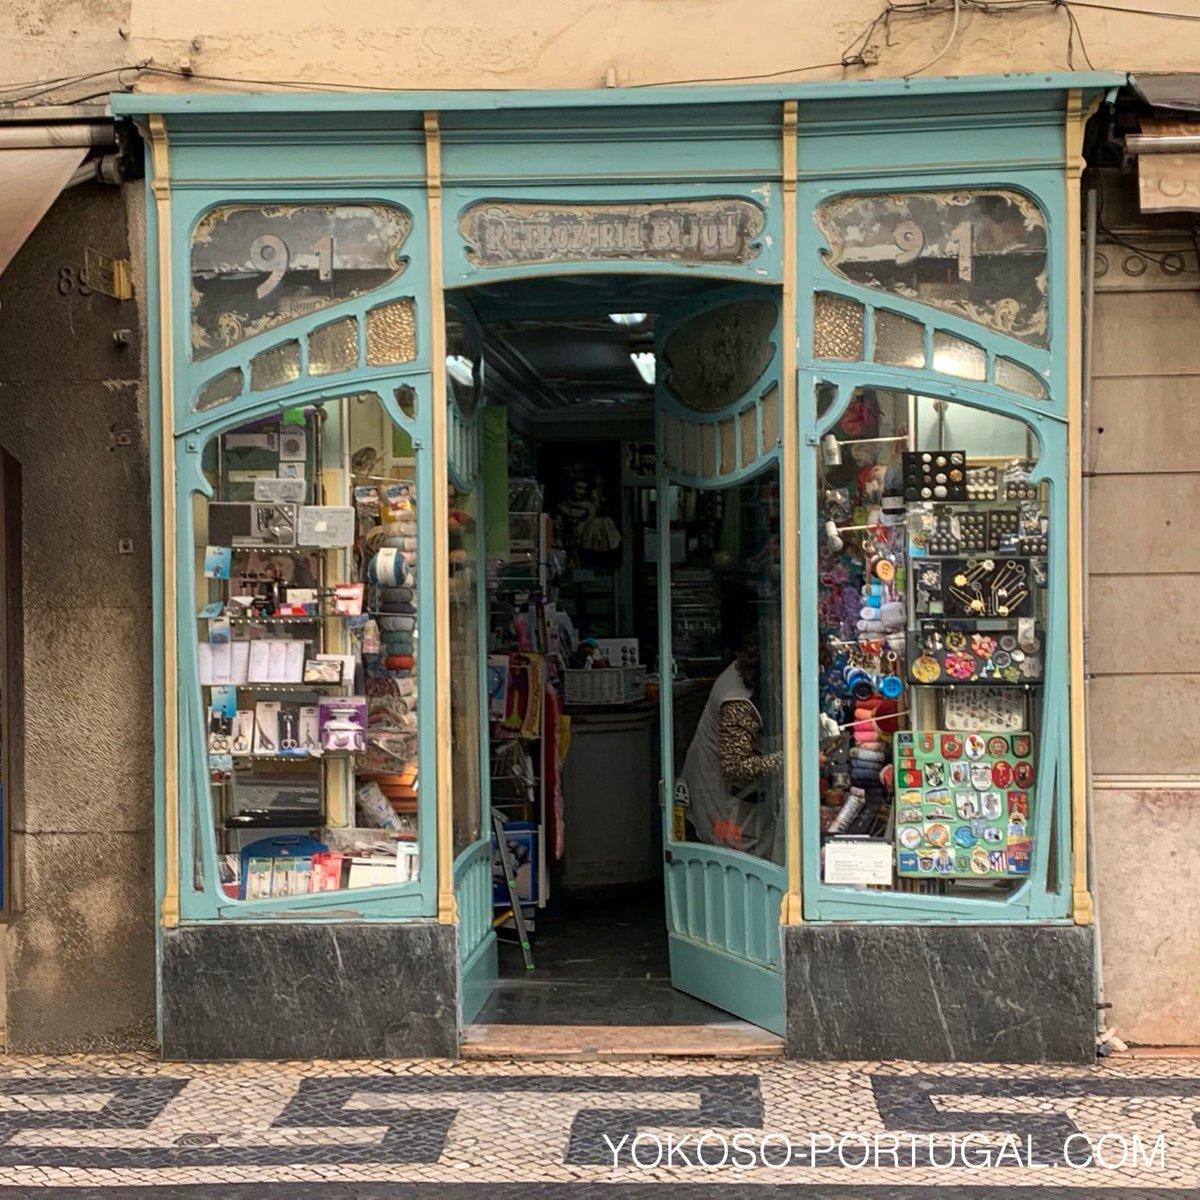 test ツイッターメディア - リスボンの現在オープンしている、お店とレストランのマップと営業時間情報です。薬局と食品、日用品のお店のみオープン、レストランはテイクアウトのみ可能です。  https://t.co/XW3Ev5X6Wd #リスボン #ポルトガル https://t.co/Lbgsr1V83E